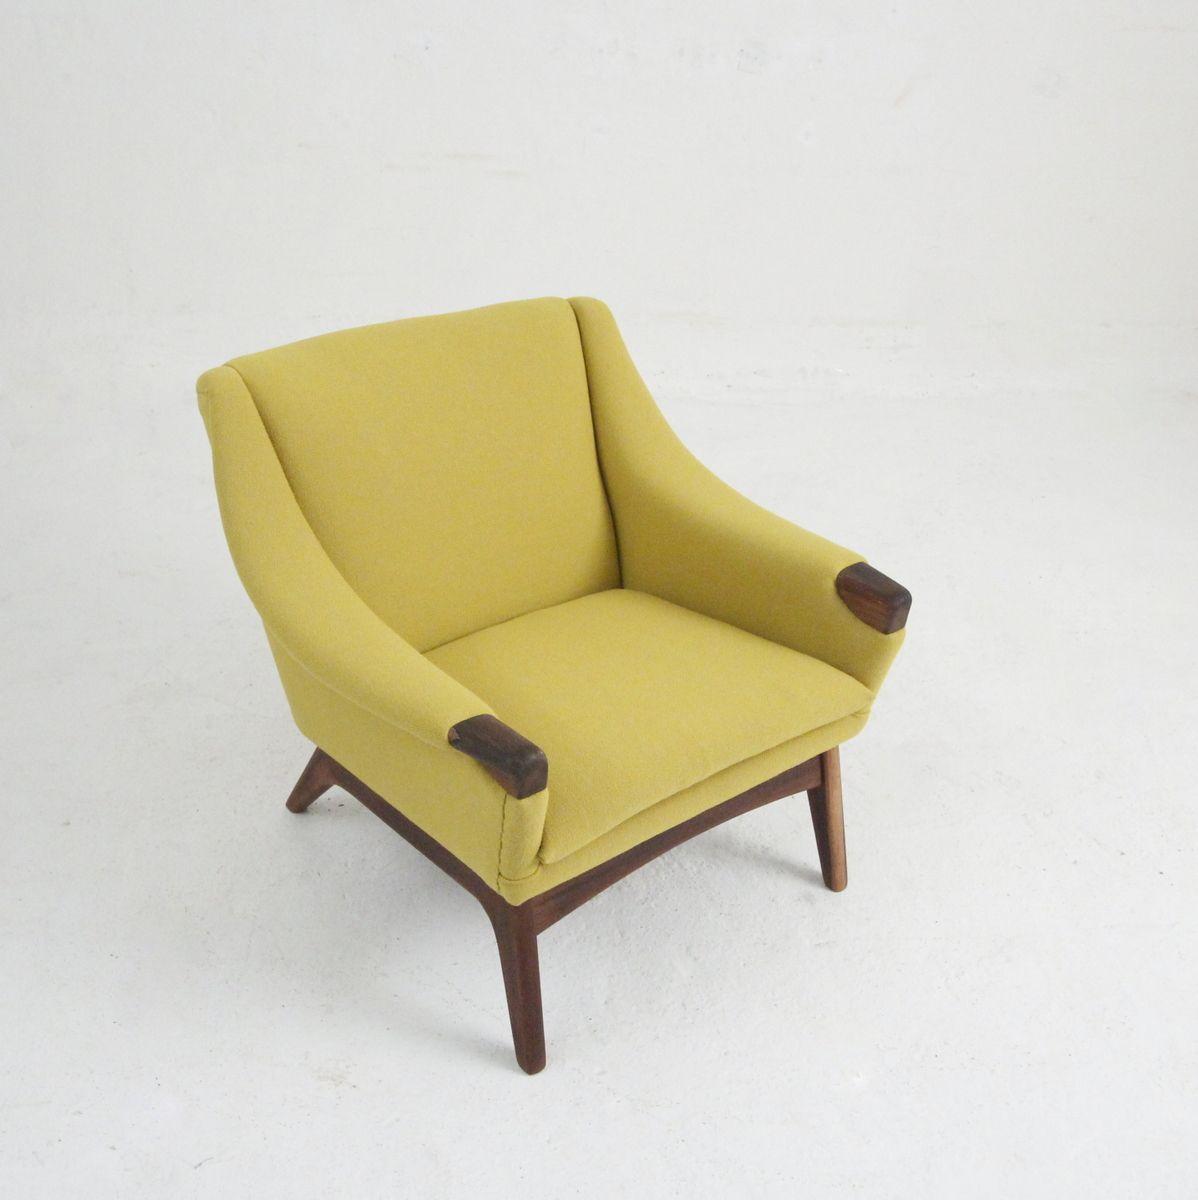 d nischer vintage sessel aus holz wolle bei pamono kaufen. Black Bedroom Furniture Sets. Home Design Ideas